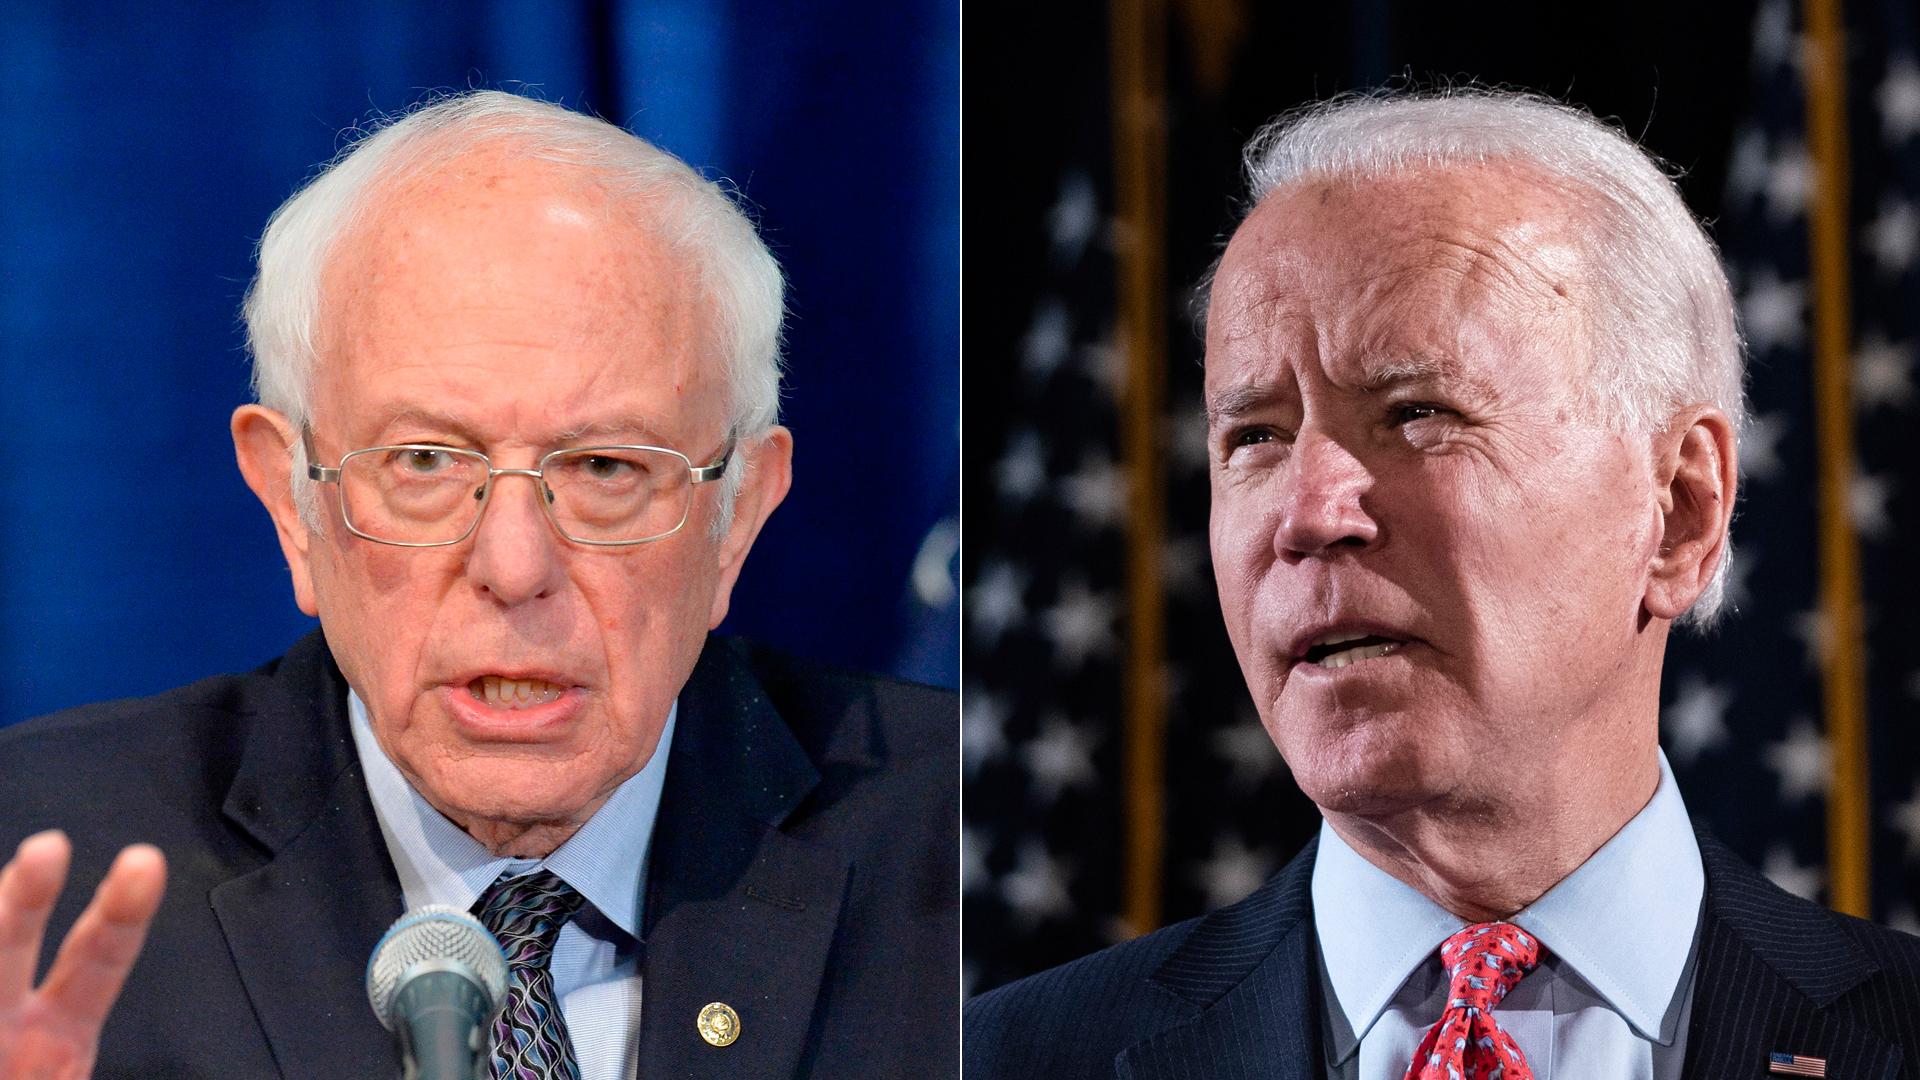 Sen. Bernie Sanders and former Vice President Joe Biden are seen separately giving remarks on coronavirus on March 11, 2020. (Credit: Getty Images; left, Drew Angerer; right, JOSEPH PREZIOSO/AFP)